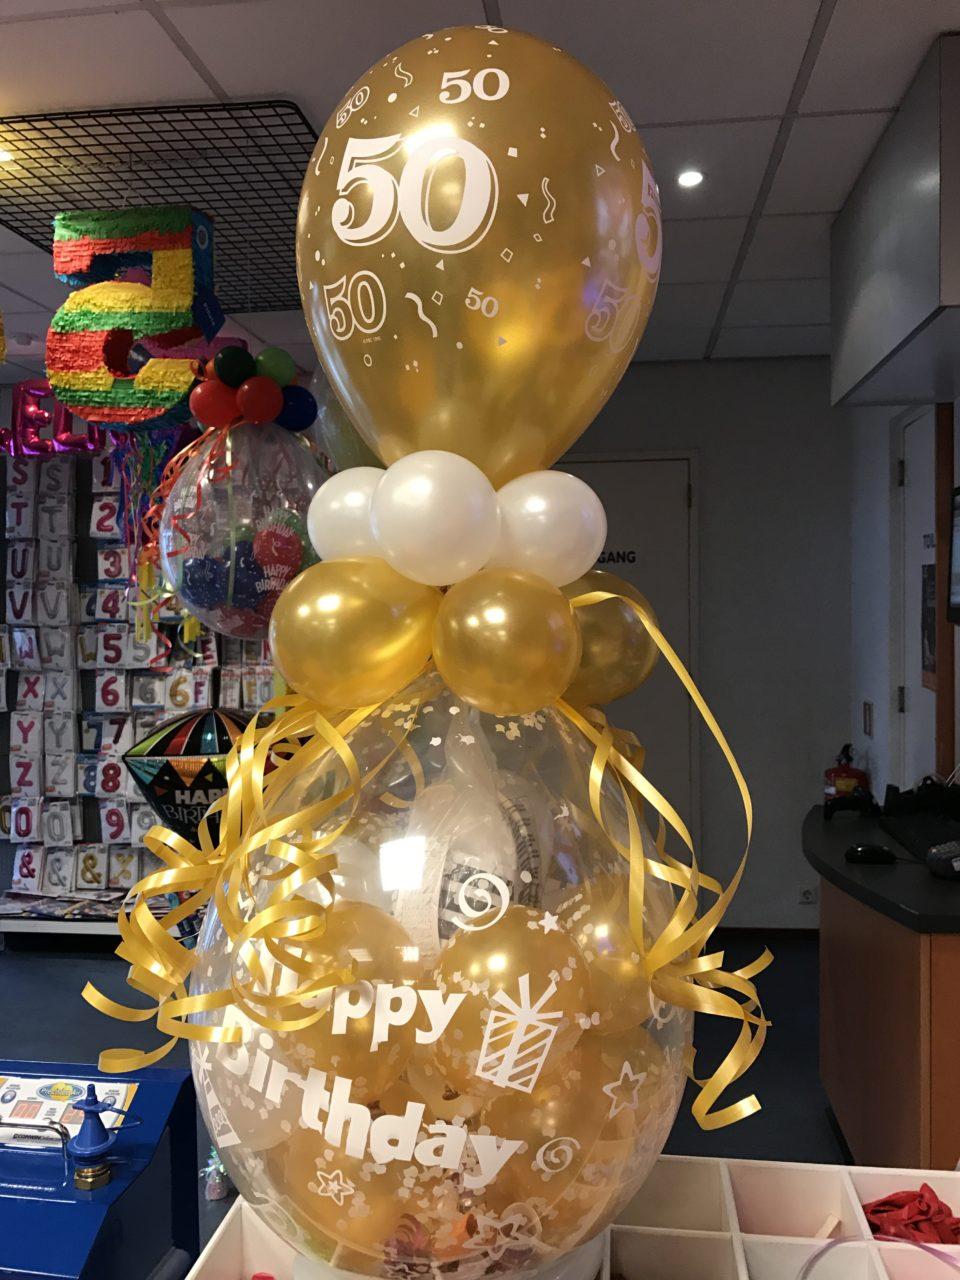 De Ballonnenkoning - ballon leeftijd 50 - goud wit bedrukt